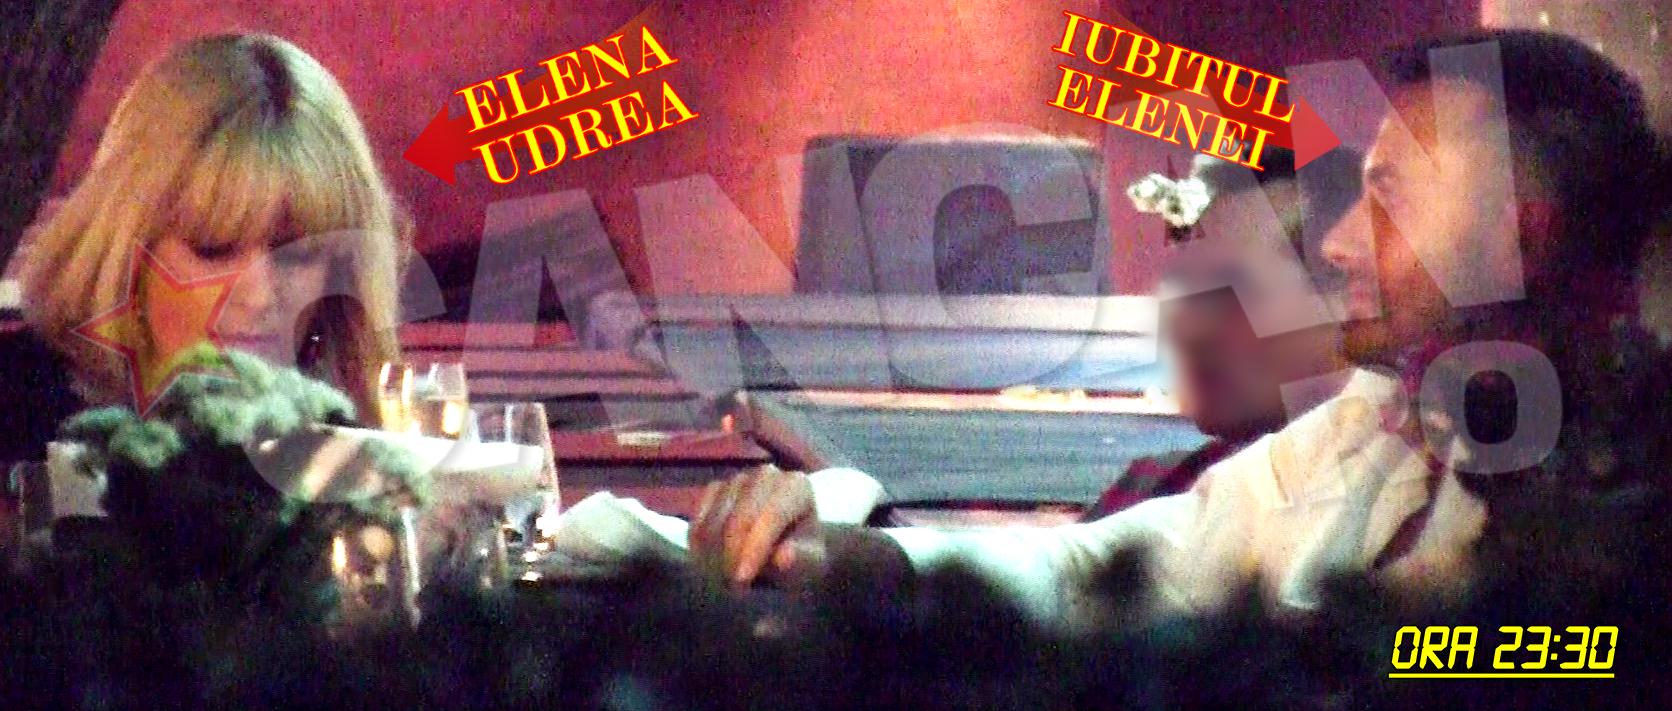 Joi, 25 iunie 2015 - ora 23.30. Elena si Valentin au luat o cina romantica intr-un restaurant de fite din Herastrau